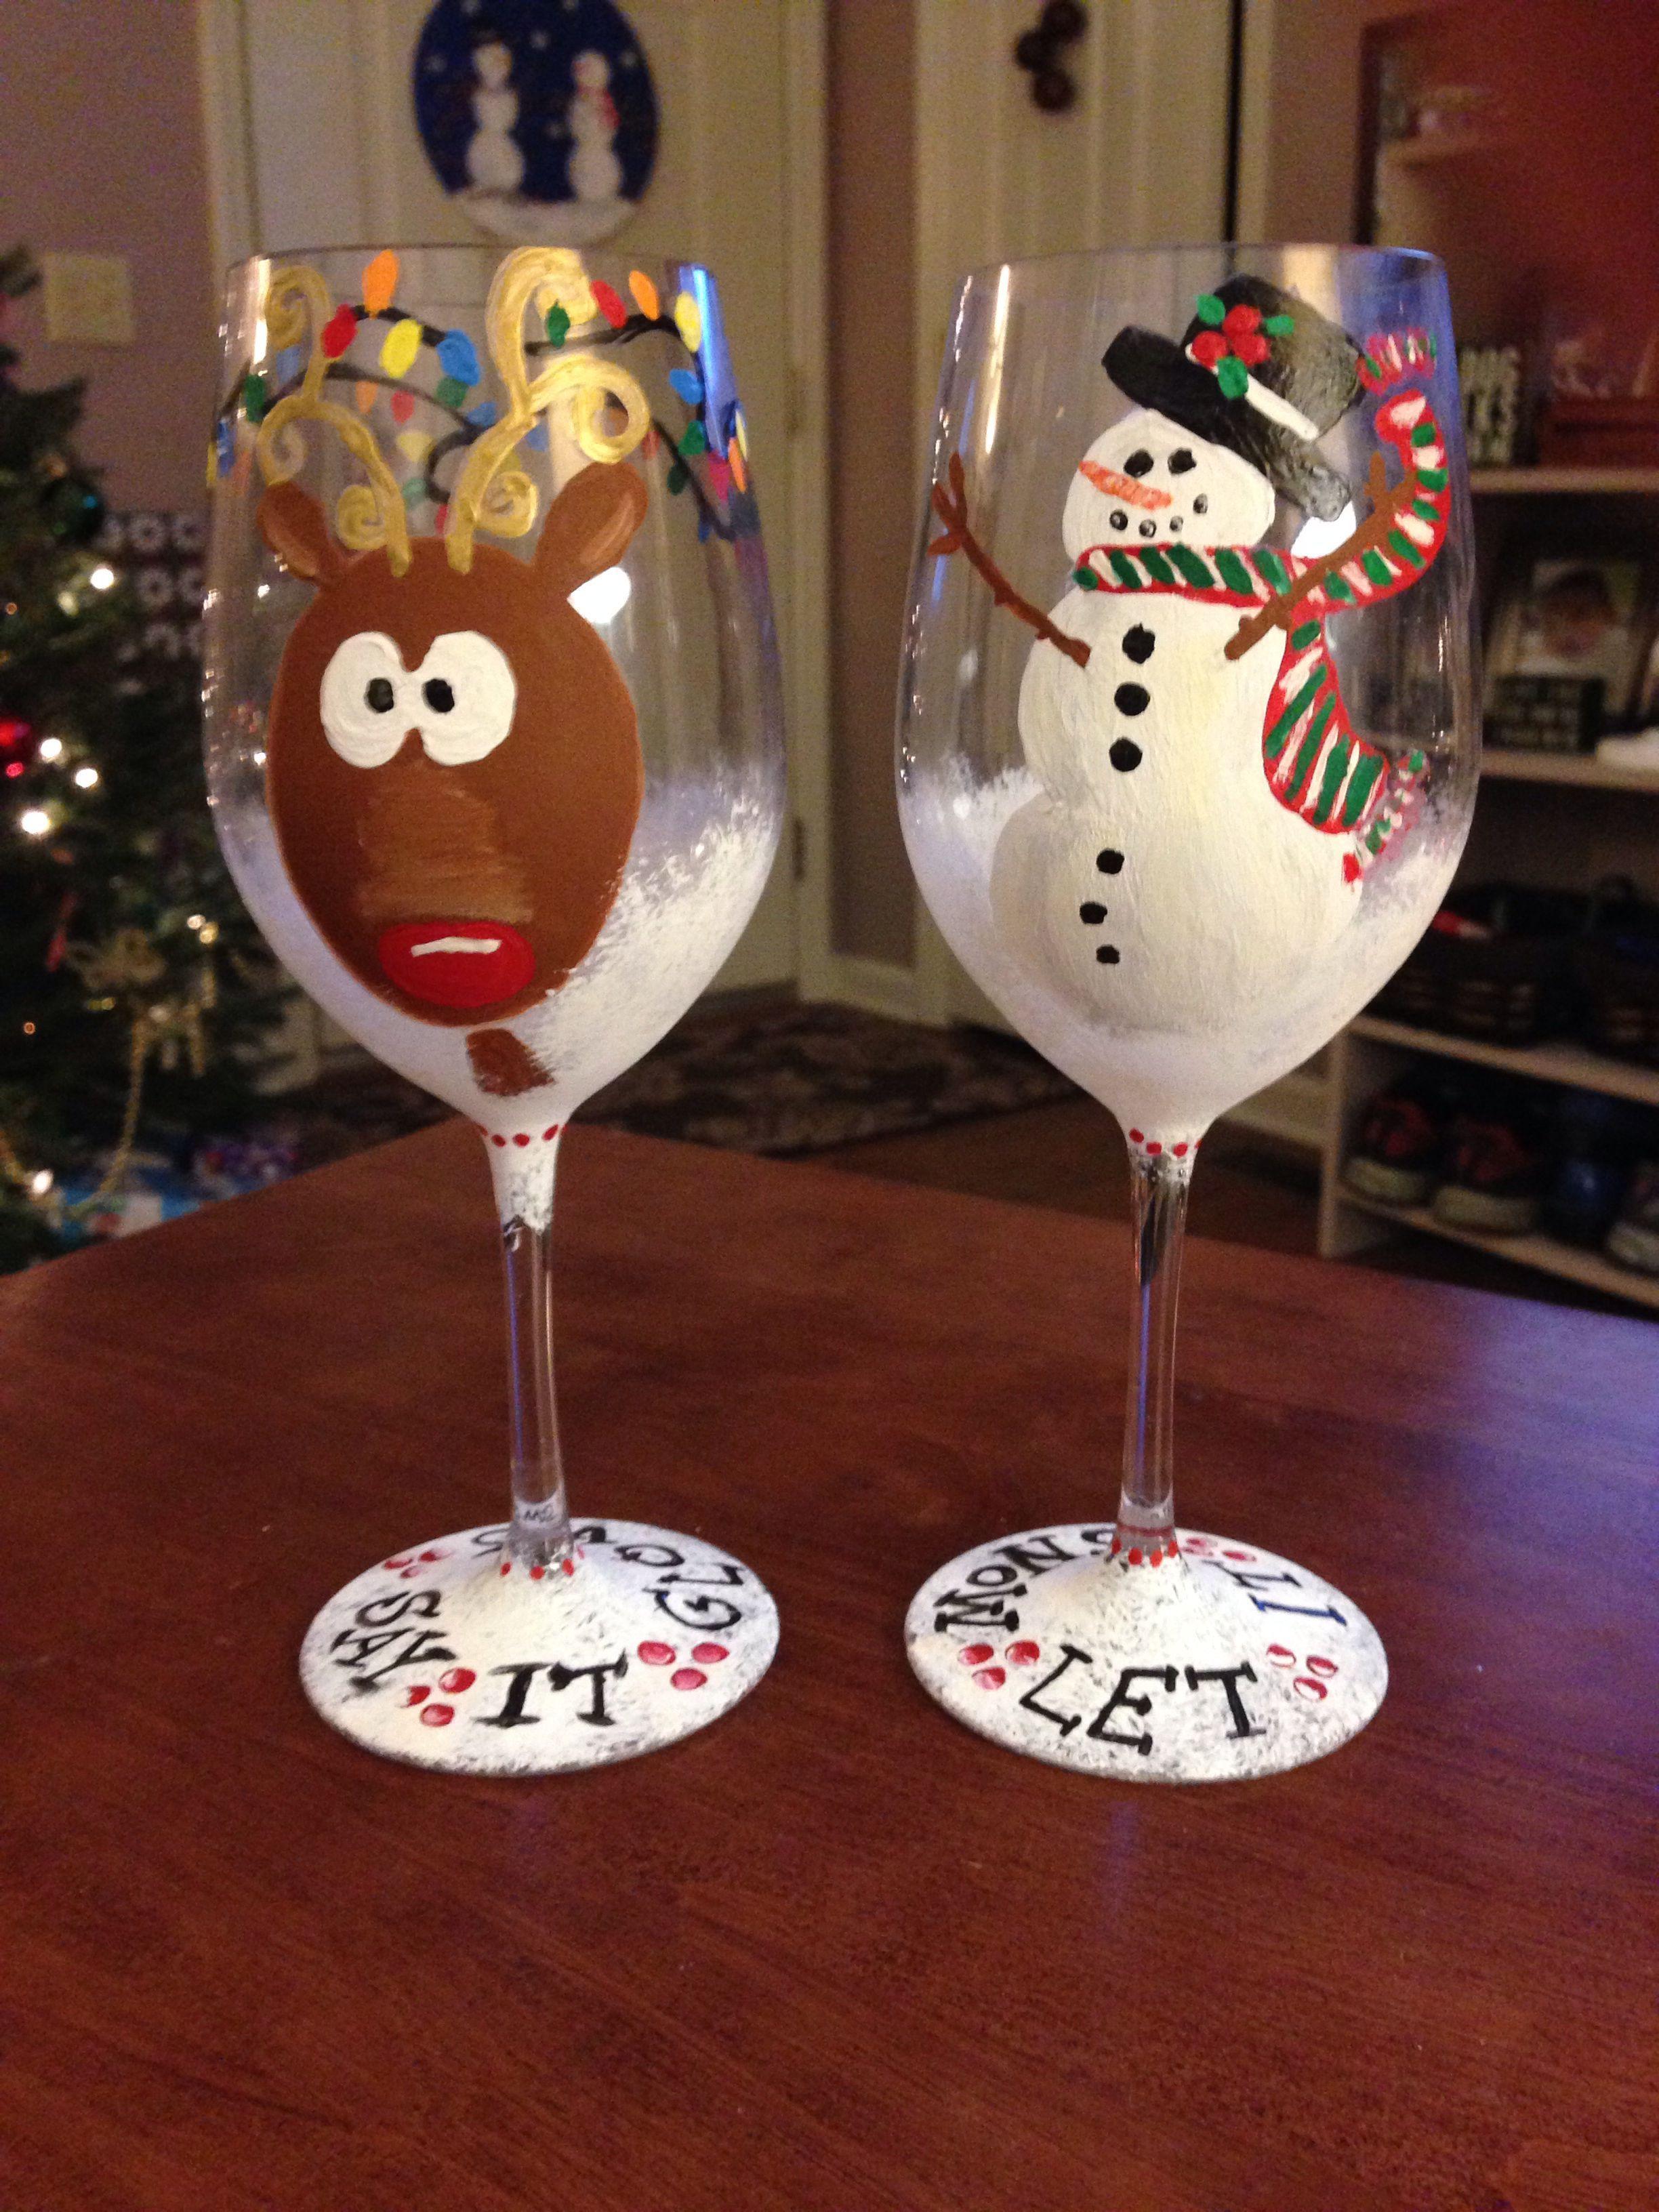 55 Decoracion De Botellas Para Navidad 2020 Check More At Https Www Adweekbrandgeniu Christmas Wine Glasses Painted Wine Glasses Christmas Diy Wine Glasses